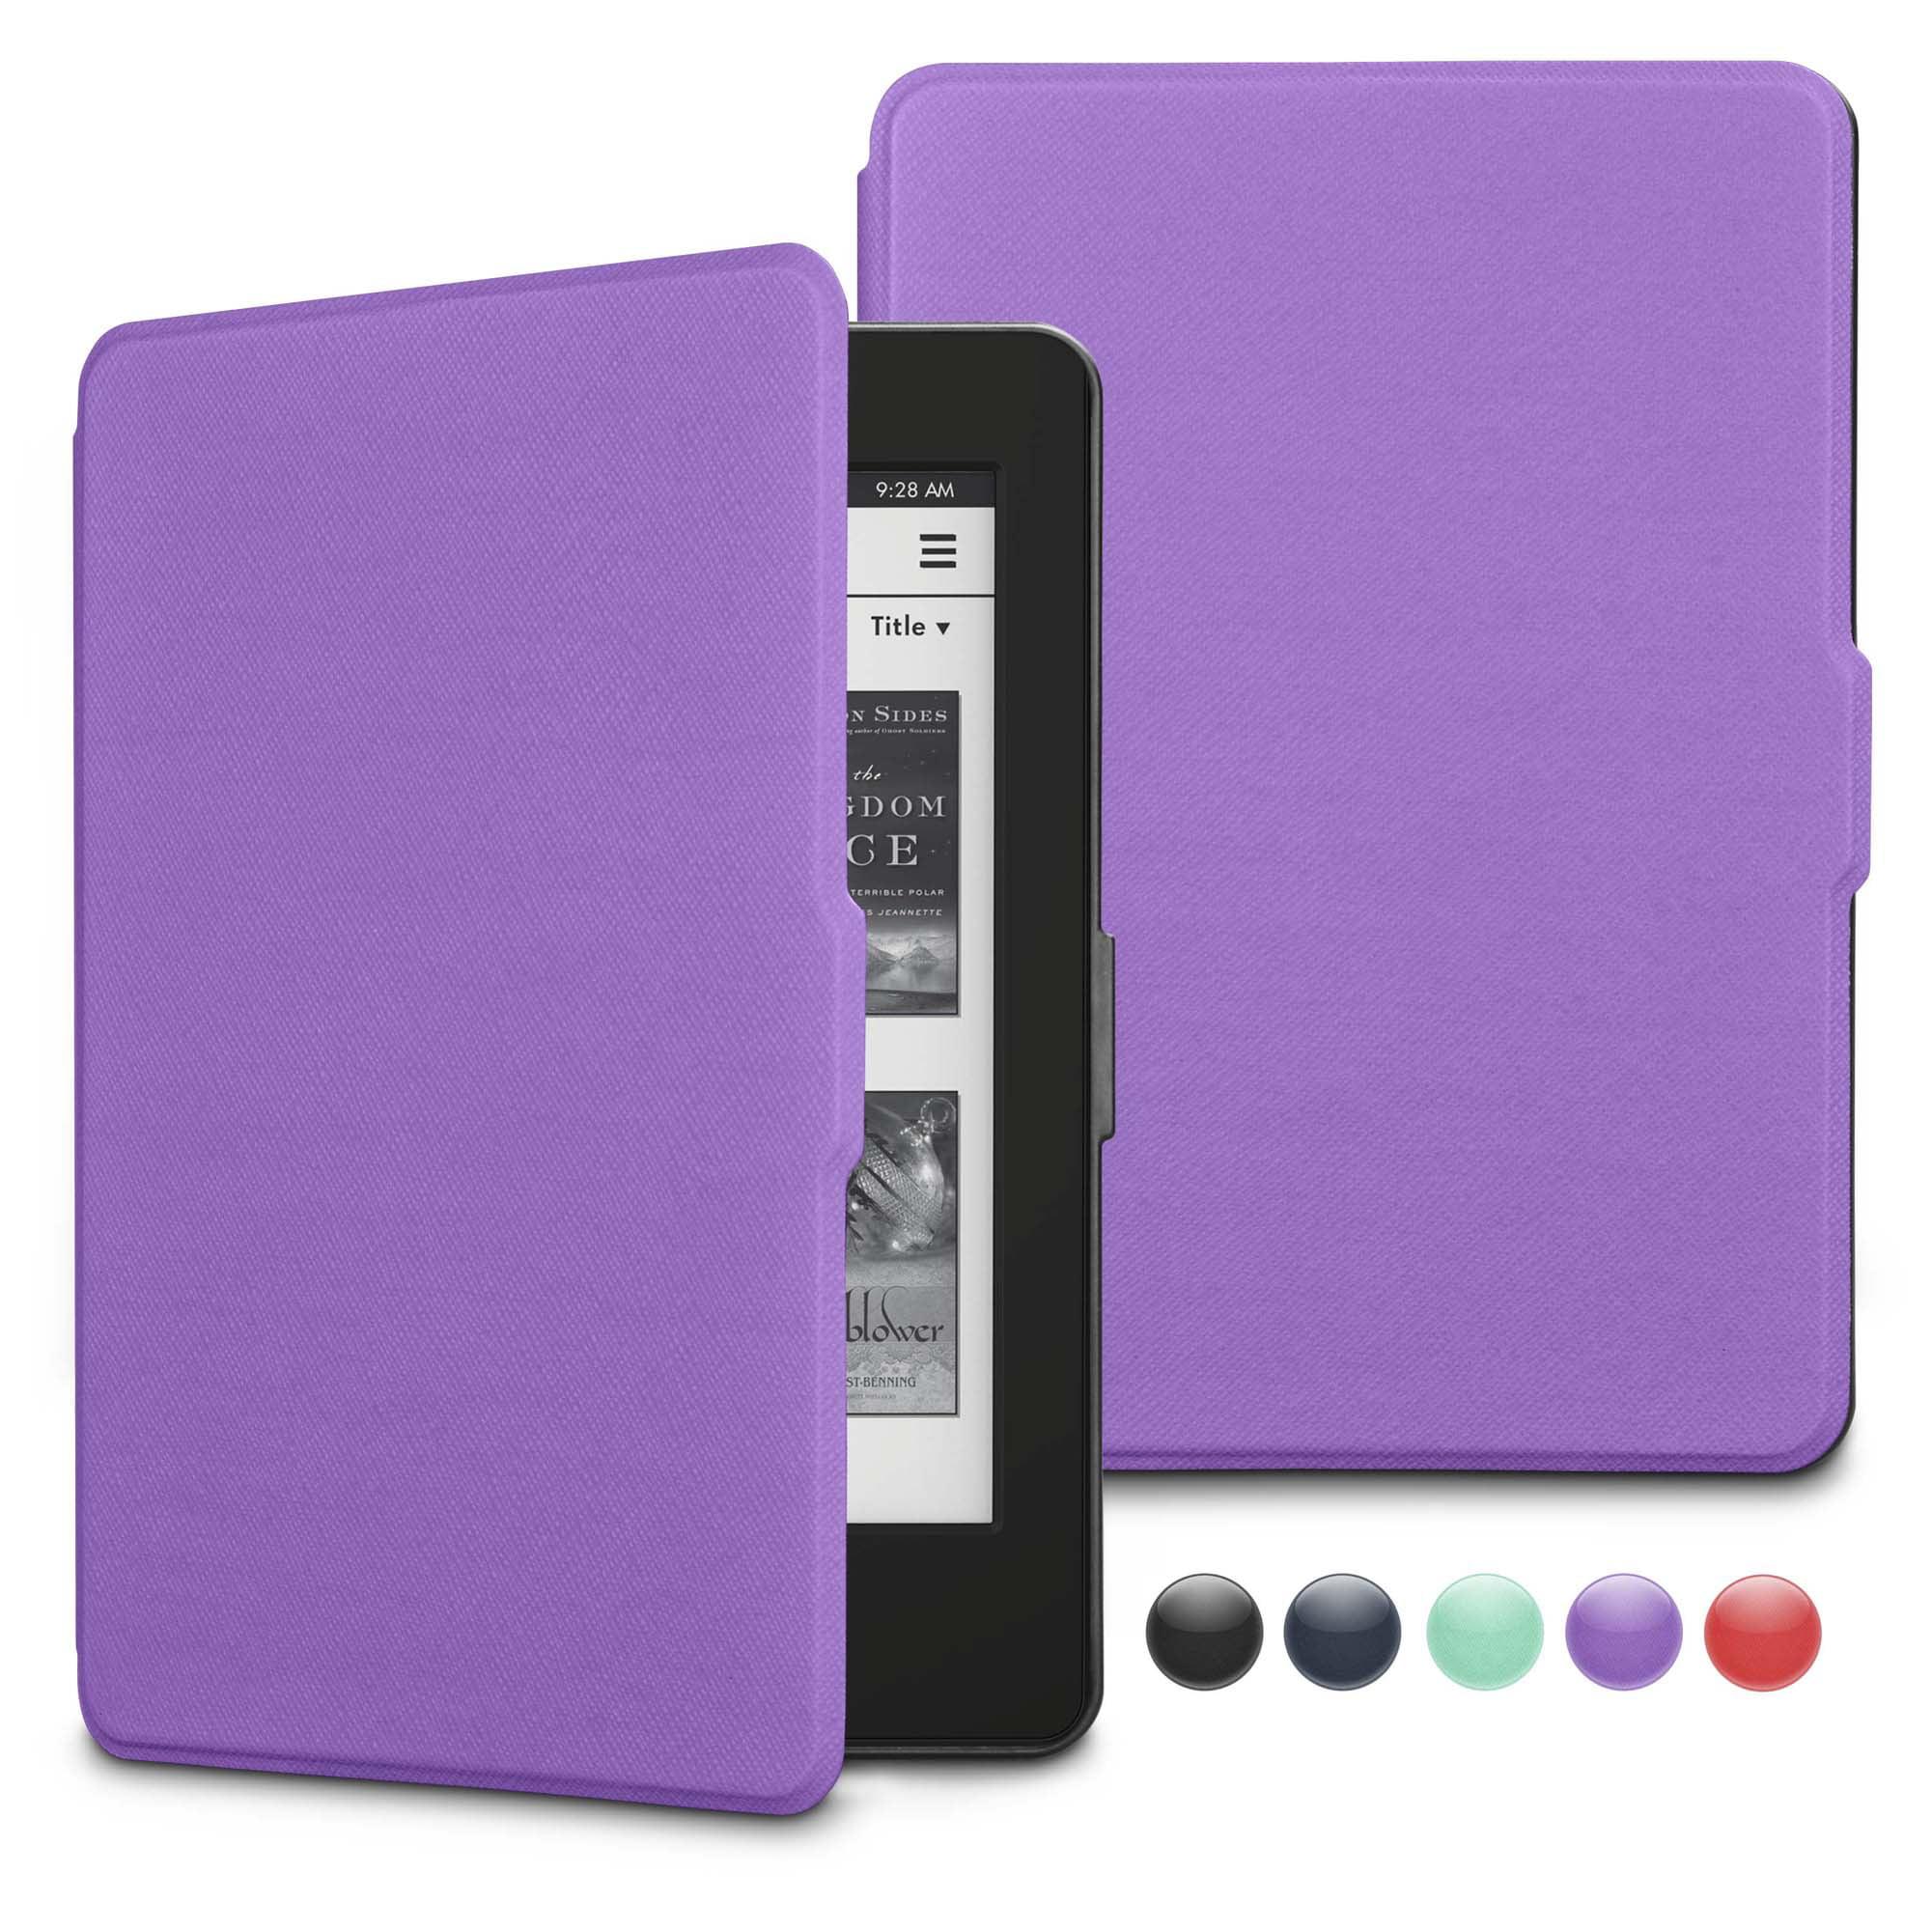 Kindle Paperwhite Case, Njjex Case Kindle Paperwhite 1/2/3